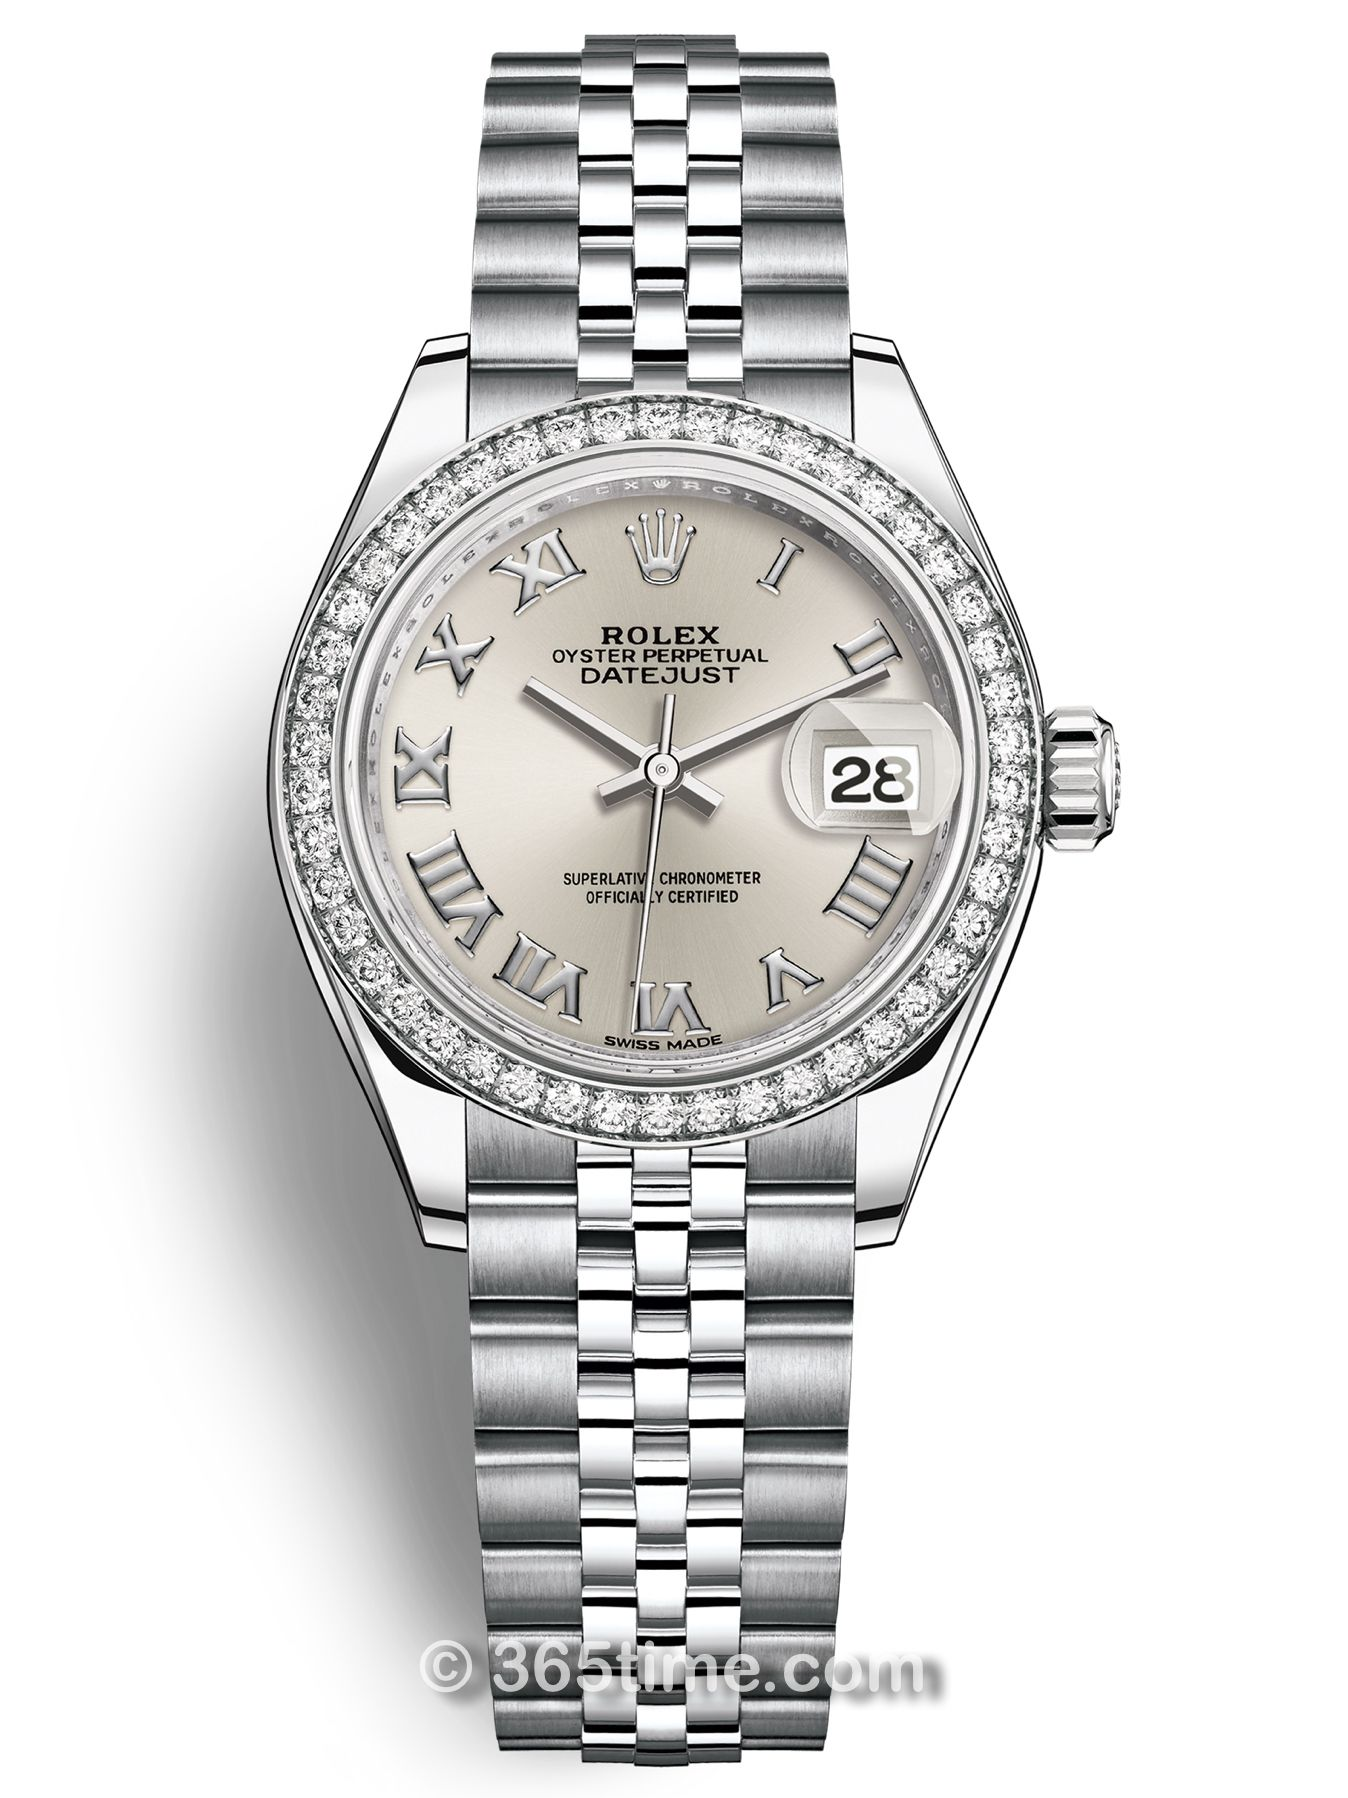 Rolex劳力士女装日志型28白金镶钻手表279384rbr-0009